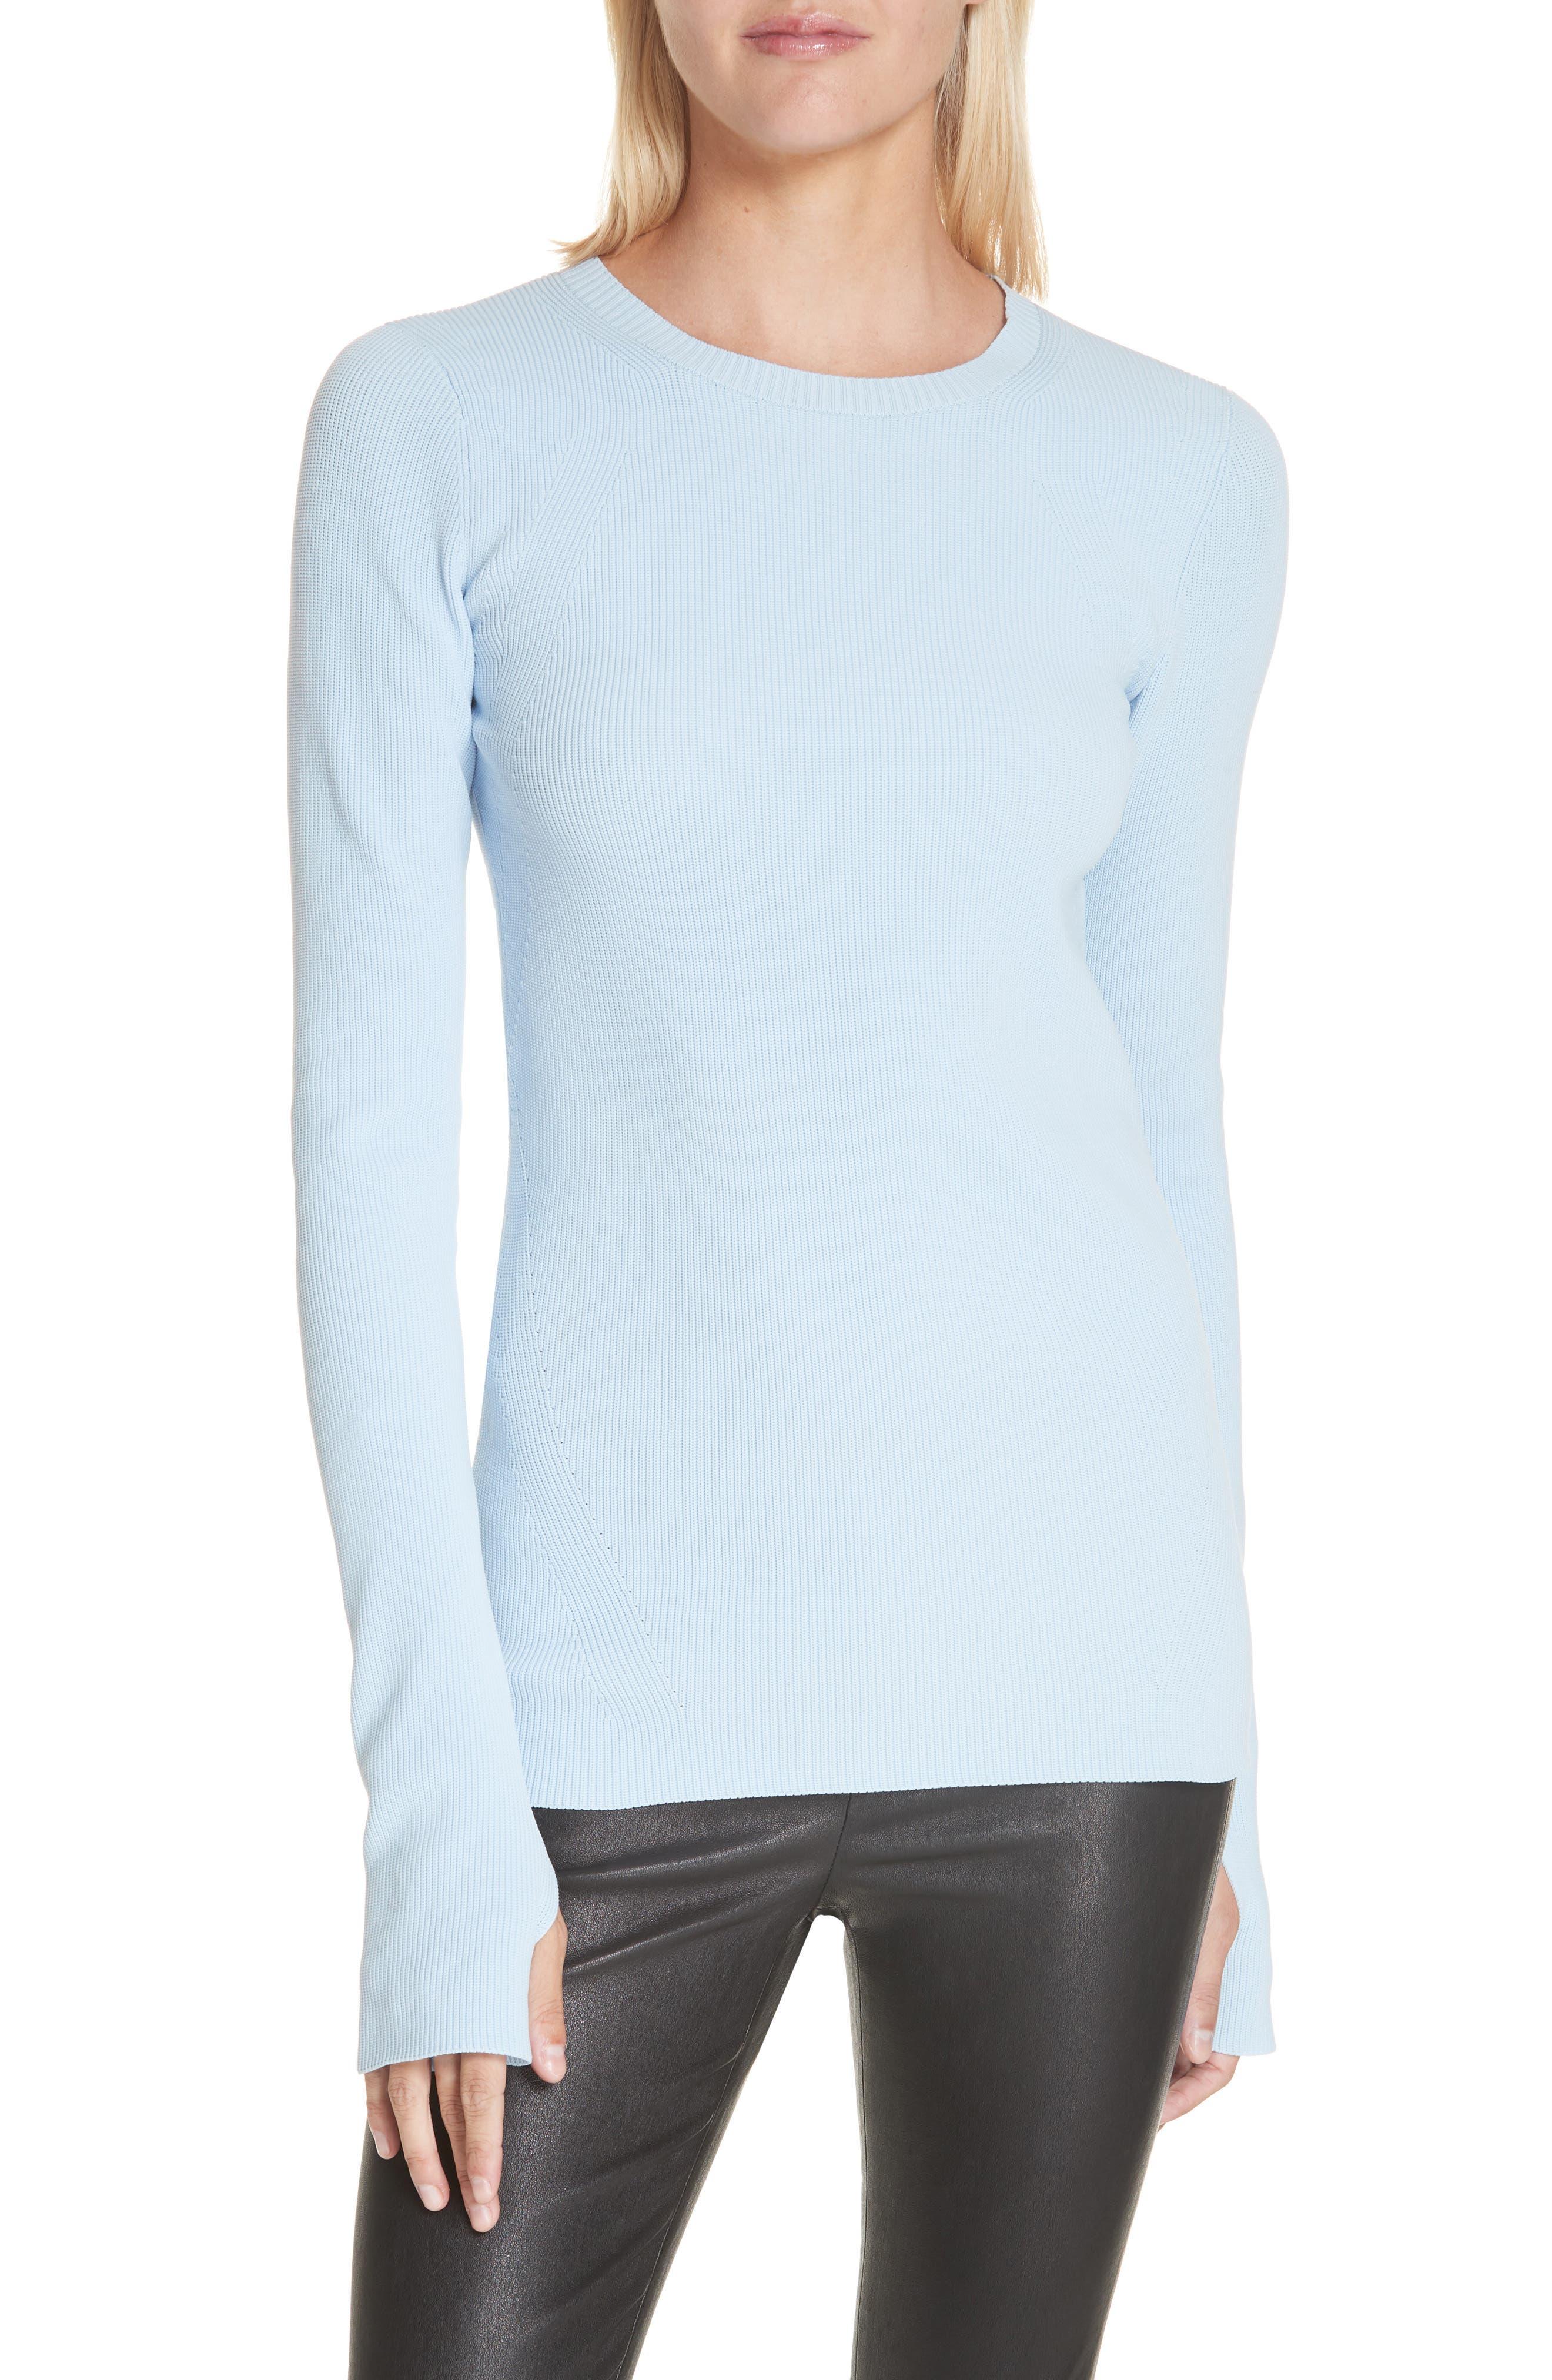 HELMUT LANG Crewneck Sweater, Main, color, LIGHT WAVE